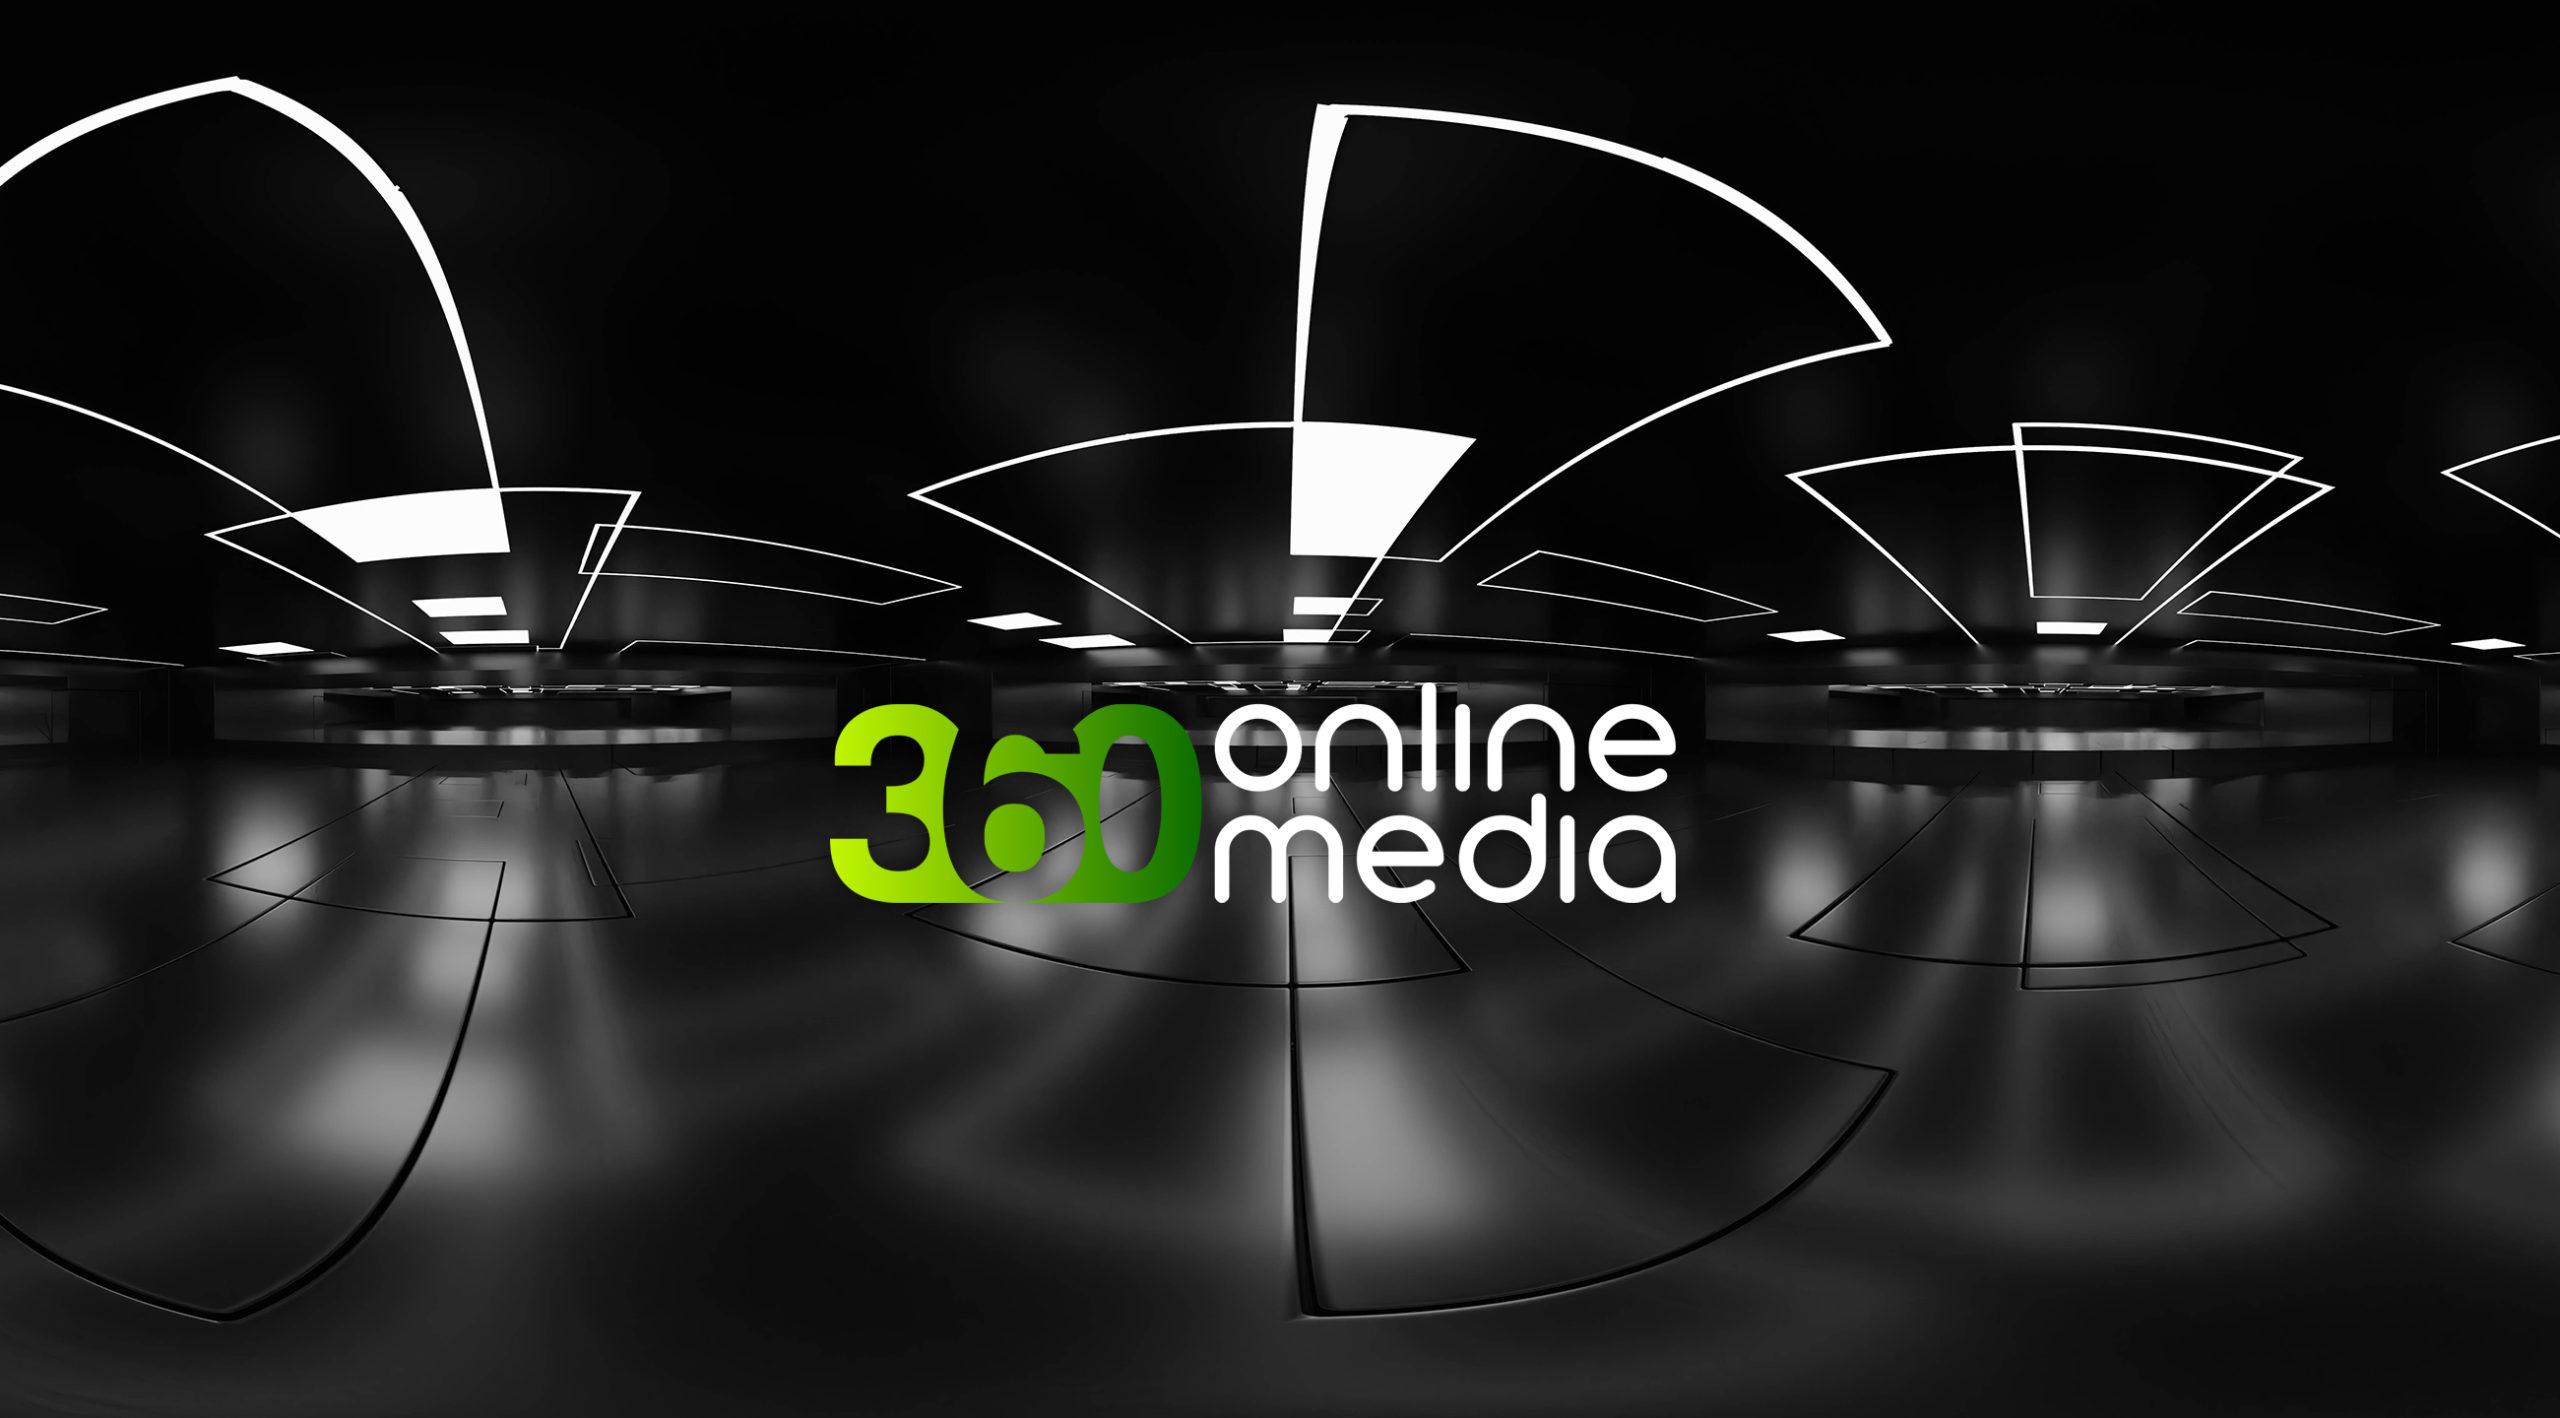 360_online_media_logo